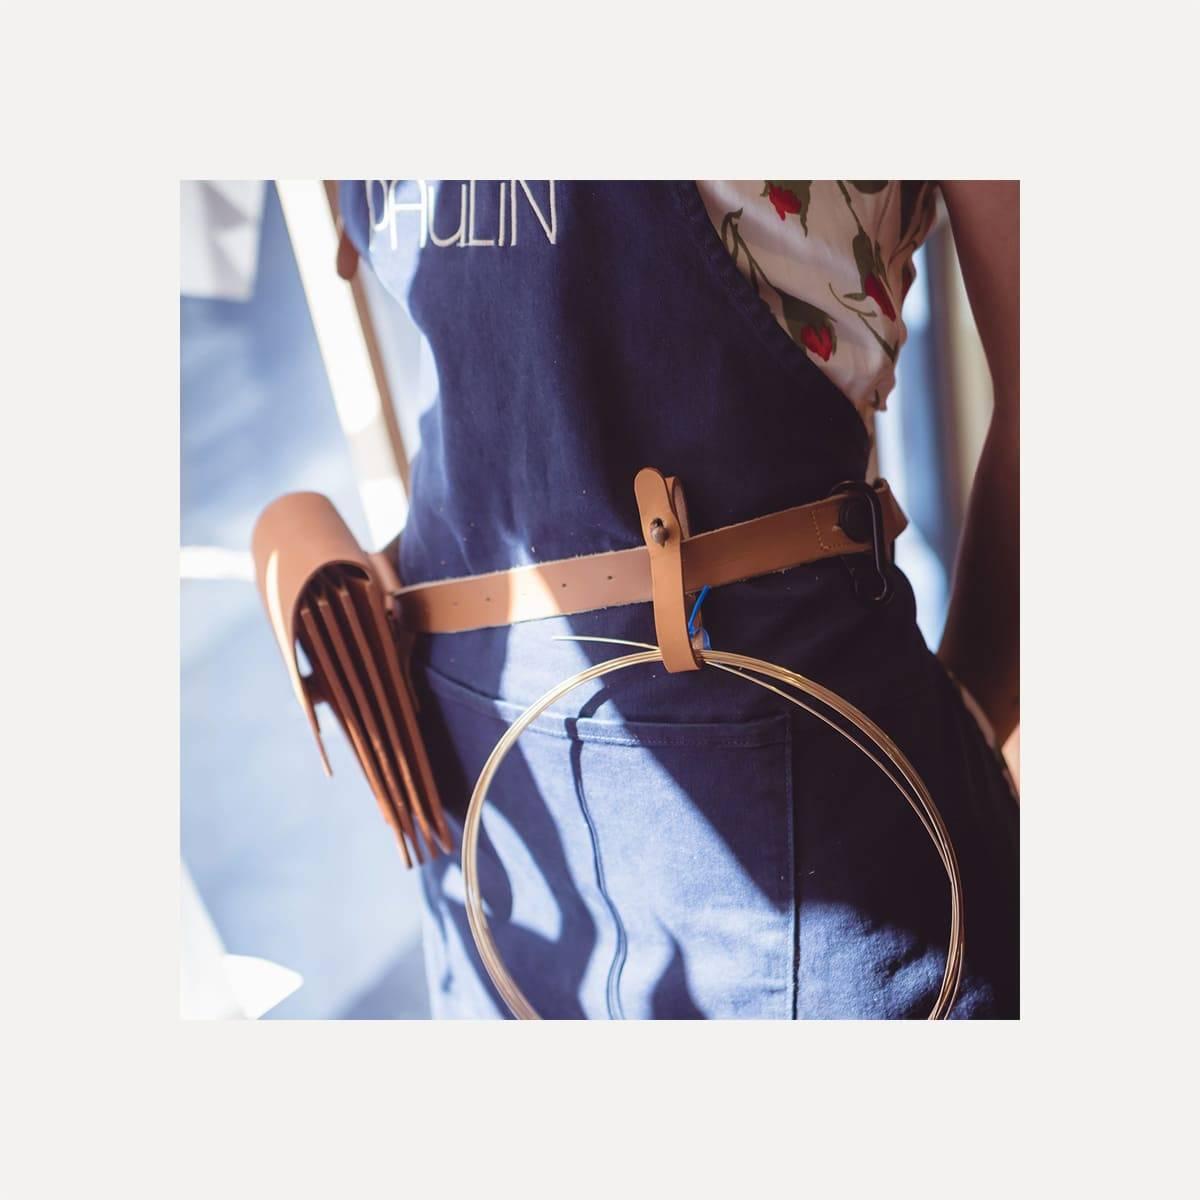 Jeweler's bag - BDC x Atelier Paulin (image n°11)